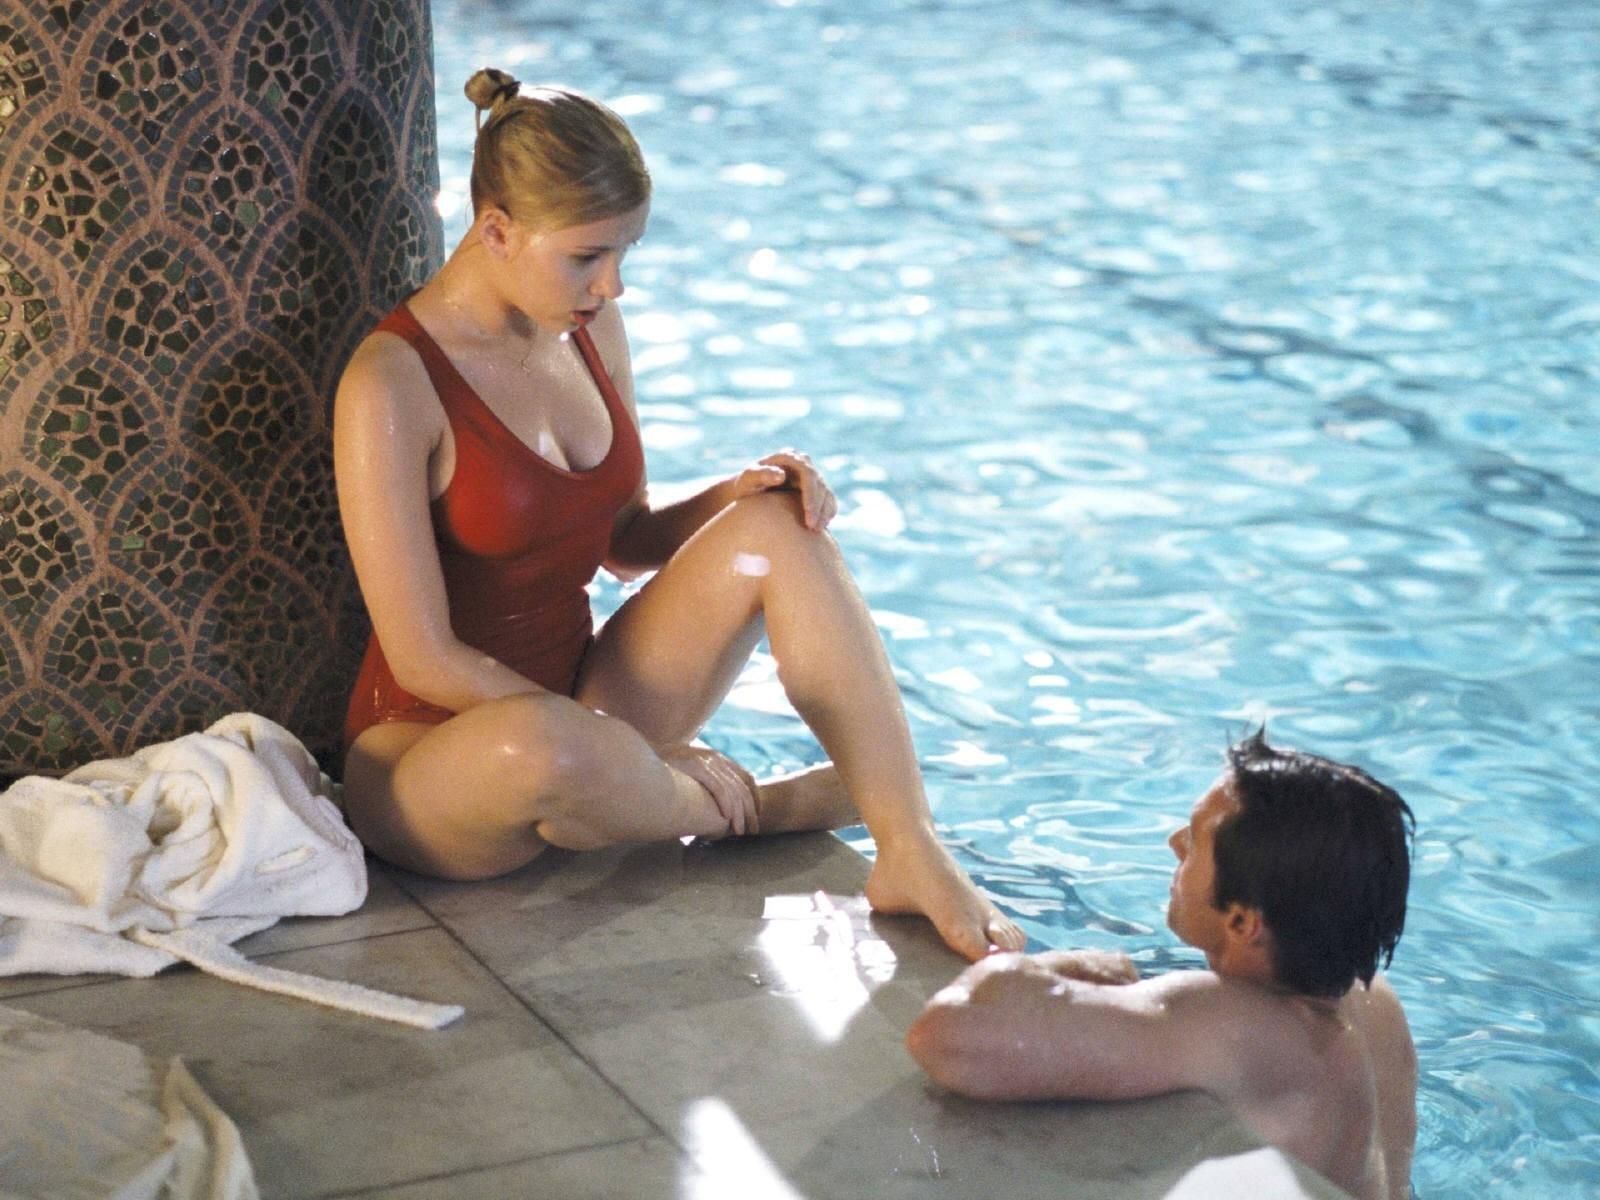 Wallpaper di Scarlett Johansson in piscina